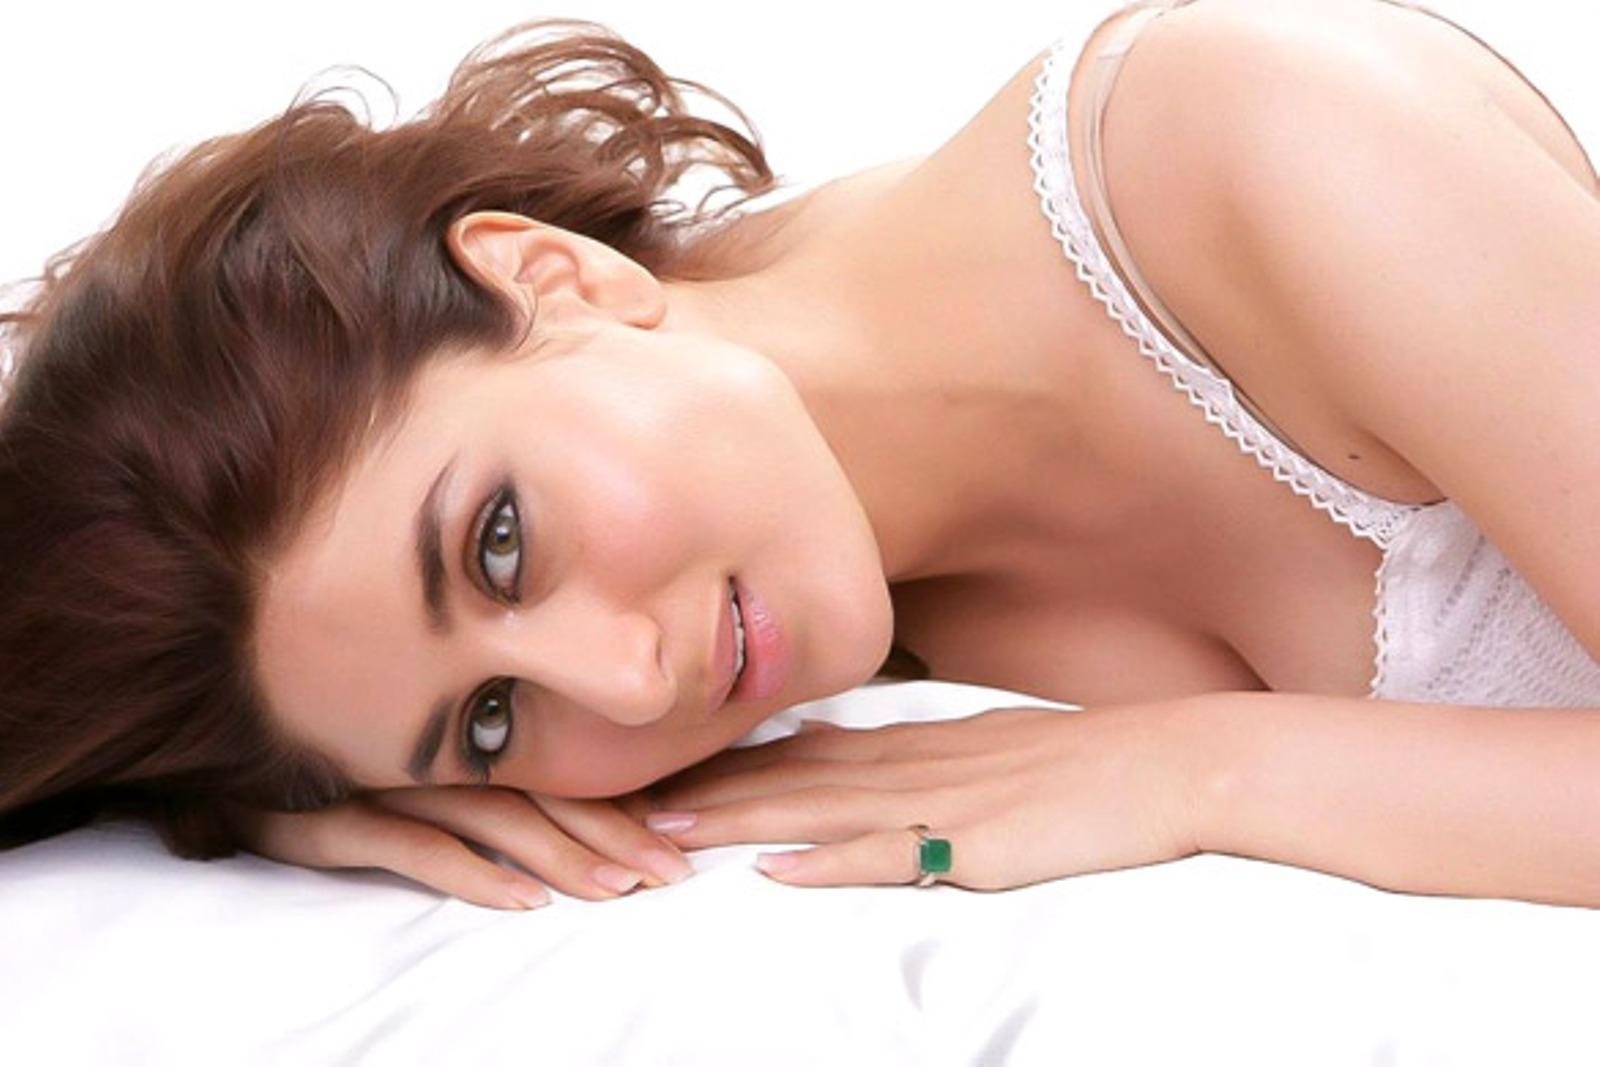 Naked Kareena Kapoor Photo